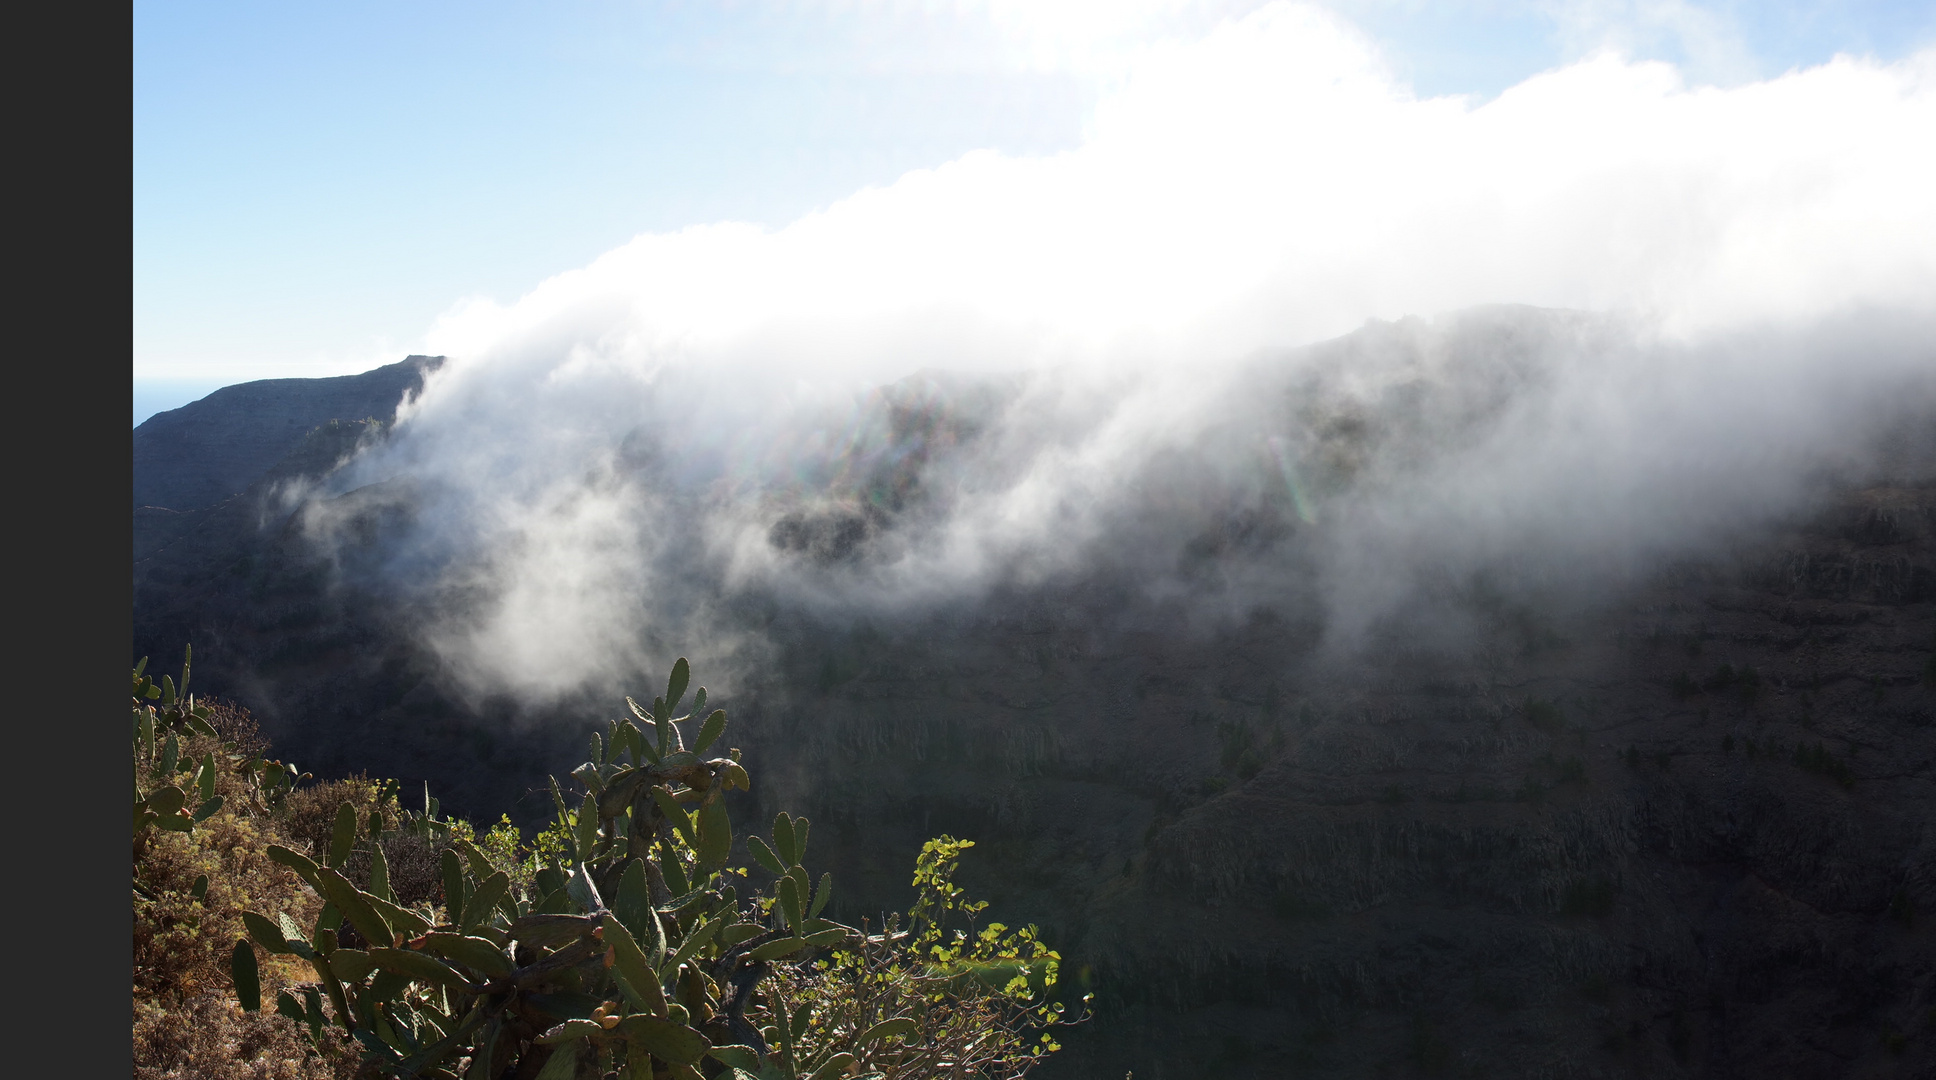 Passatwolken über La Merica (1)